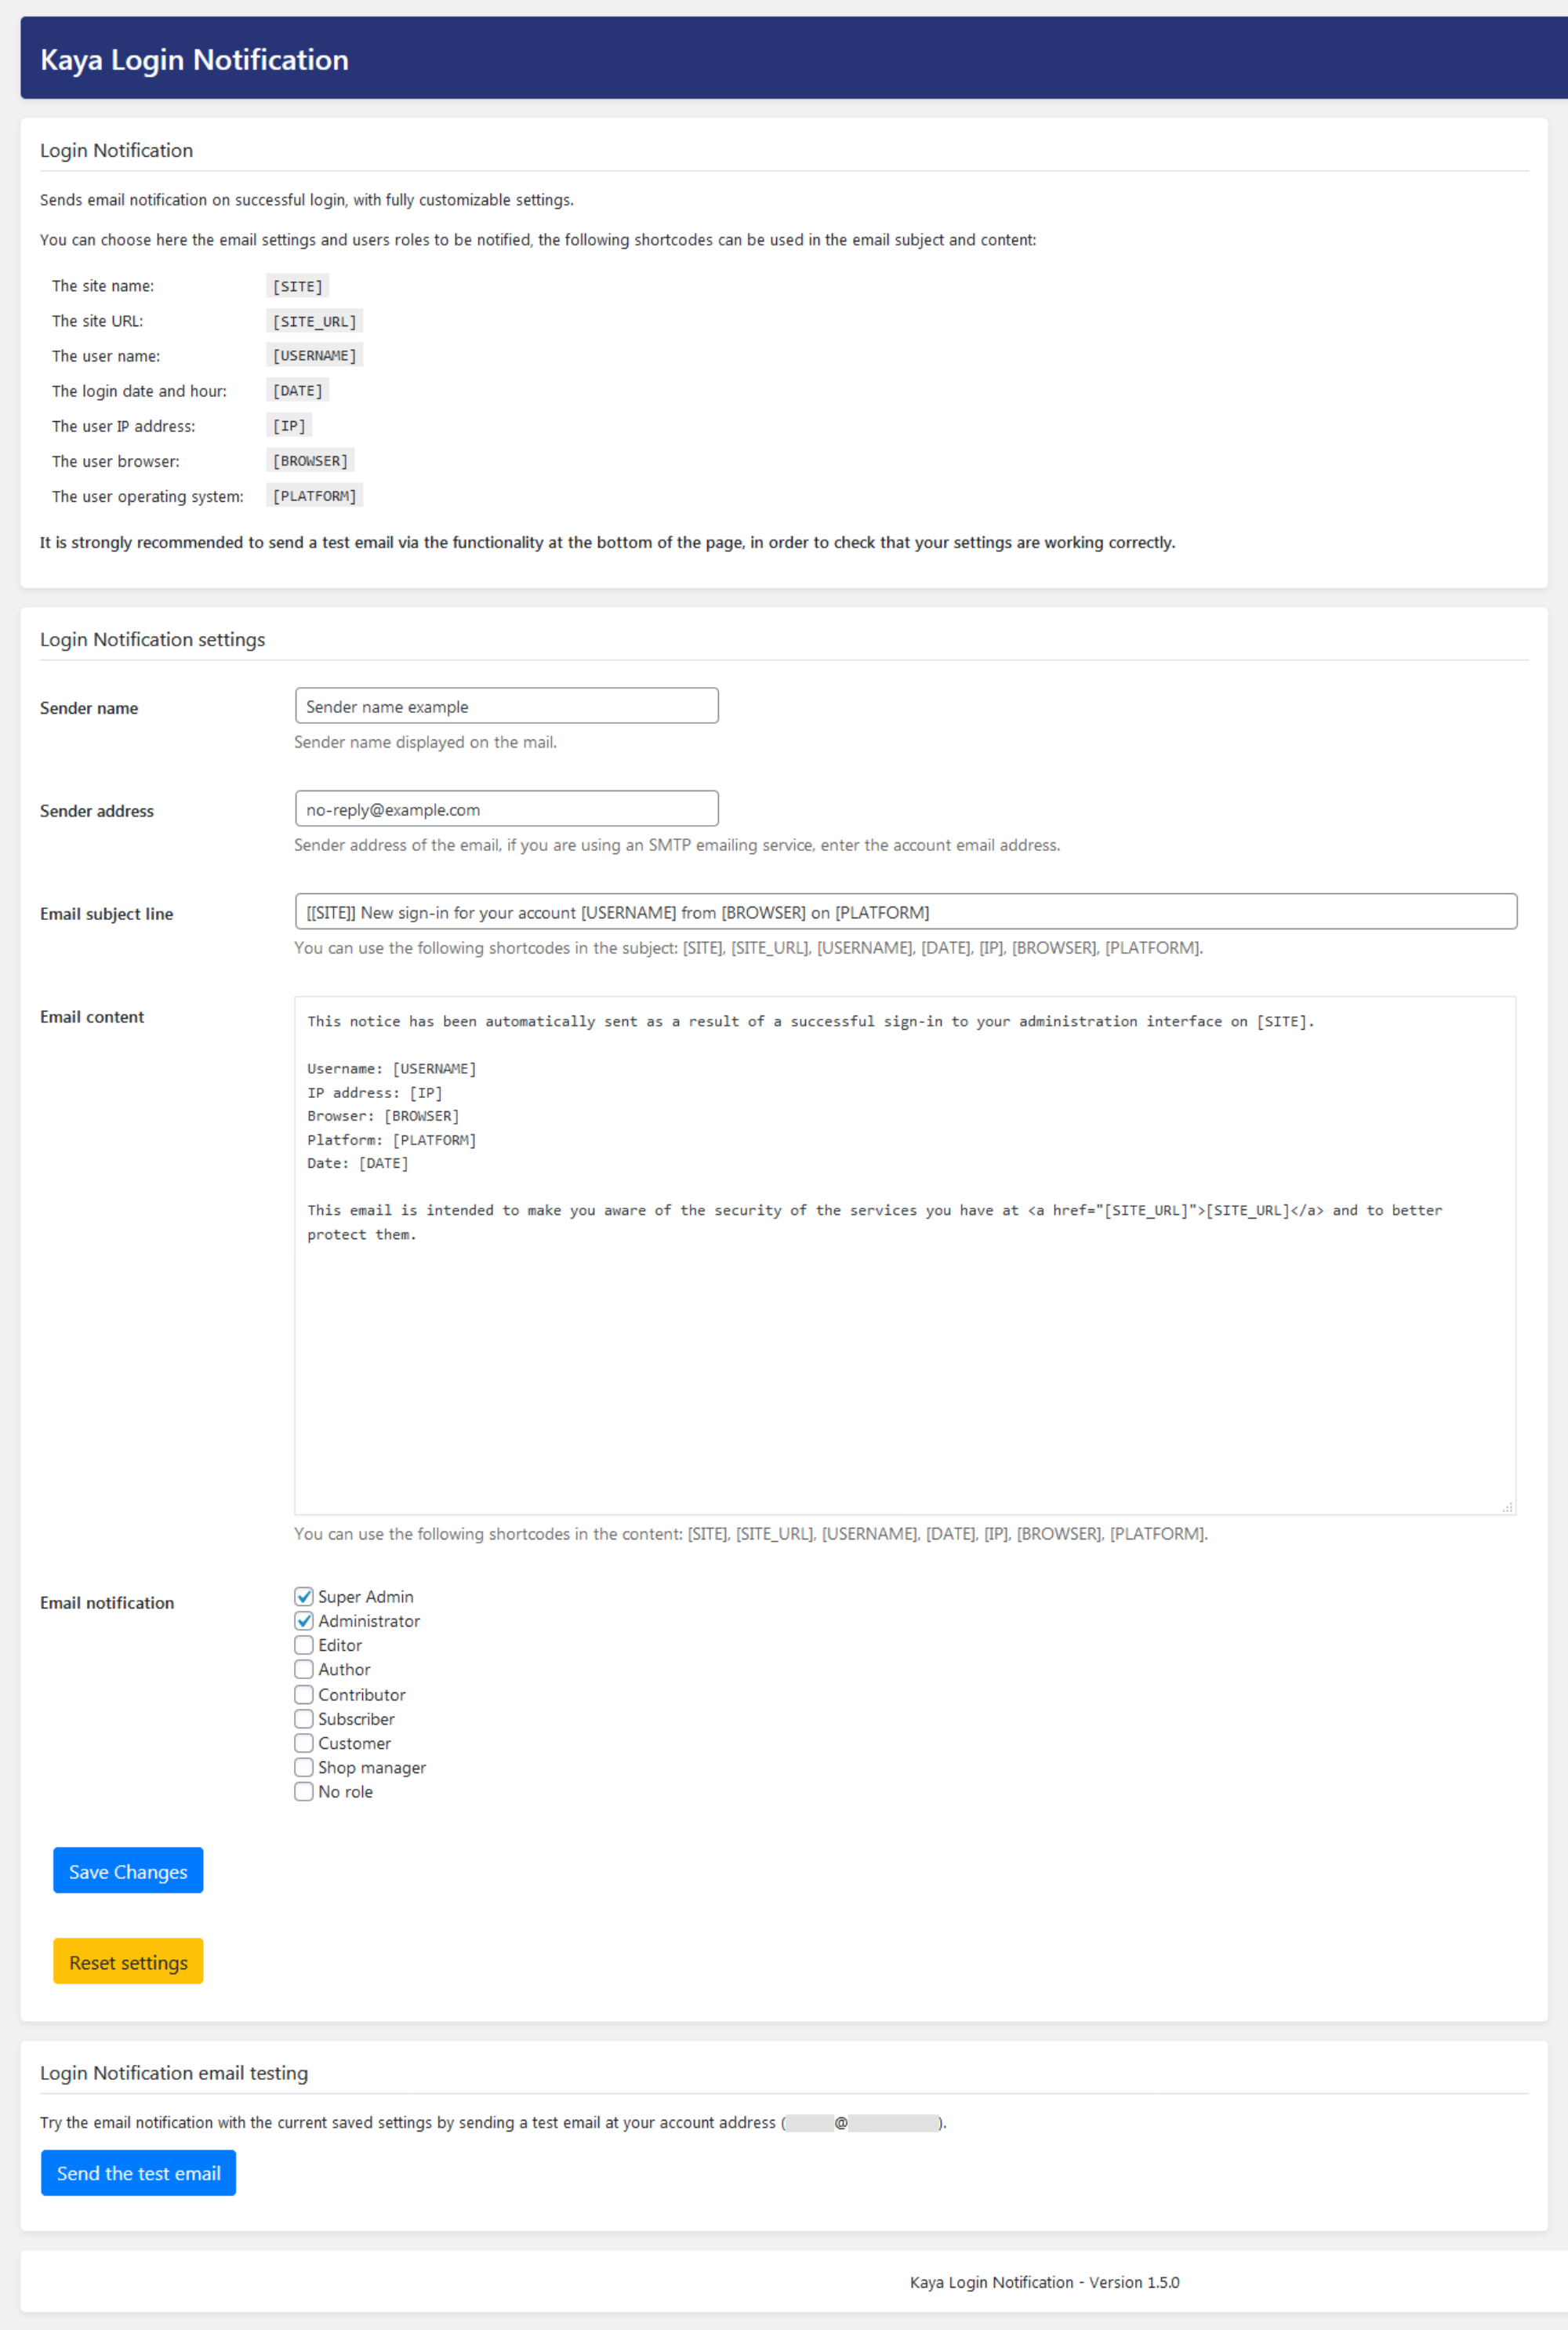 Kaya Login Notification settings page.